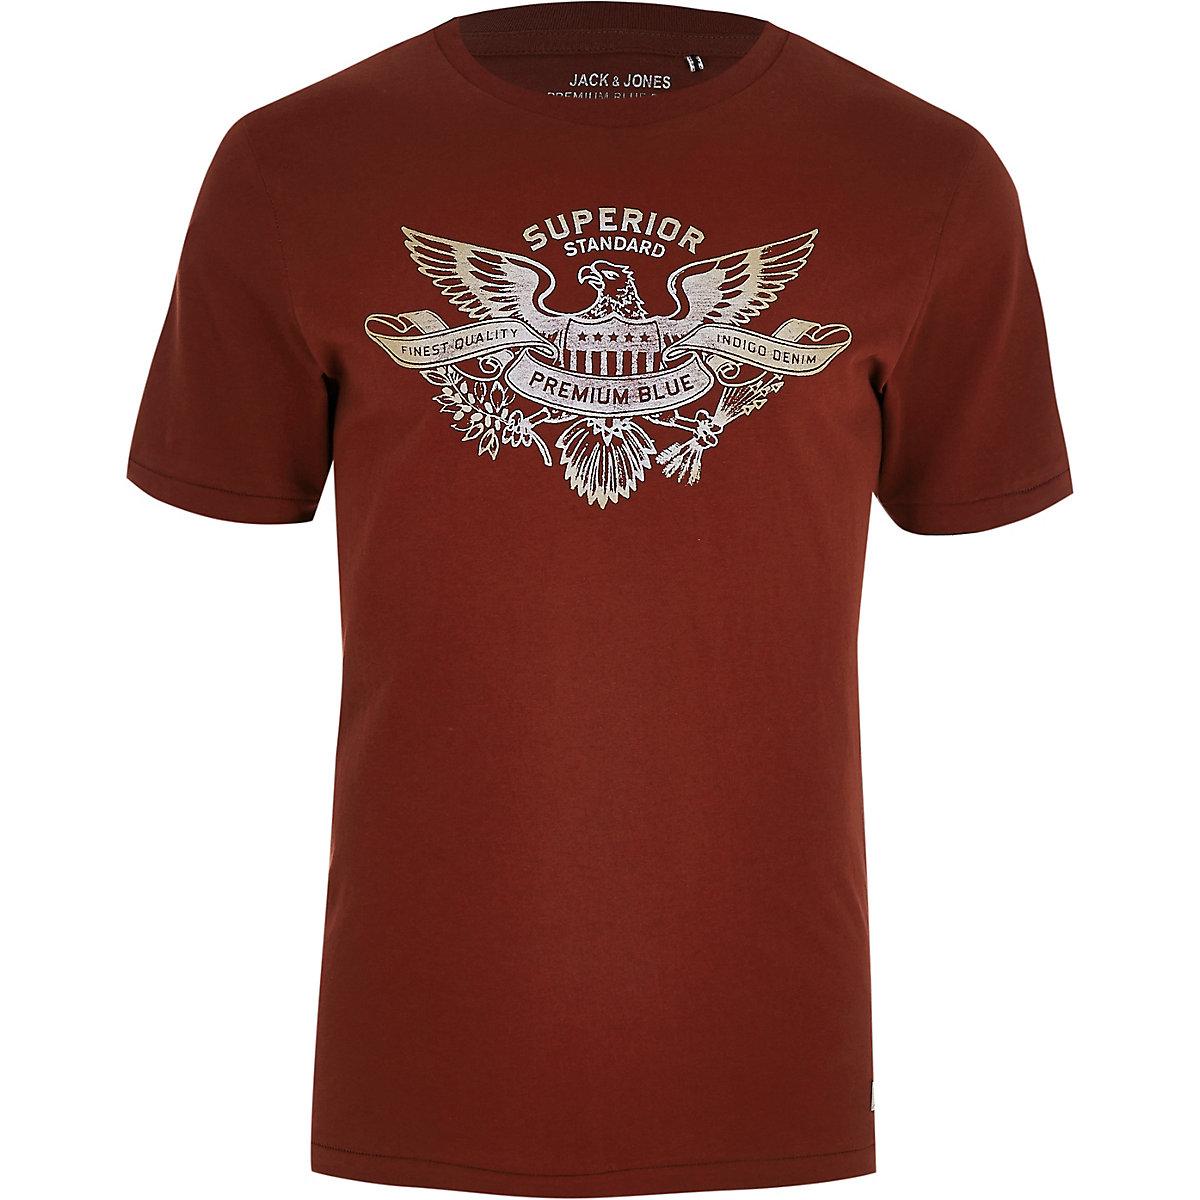 Jack & Jones brown 'premium blue' T-shirt